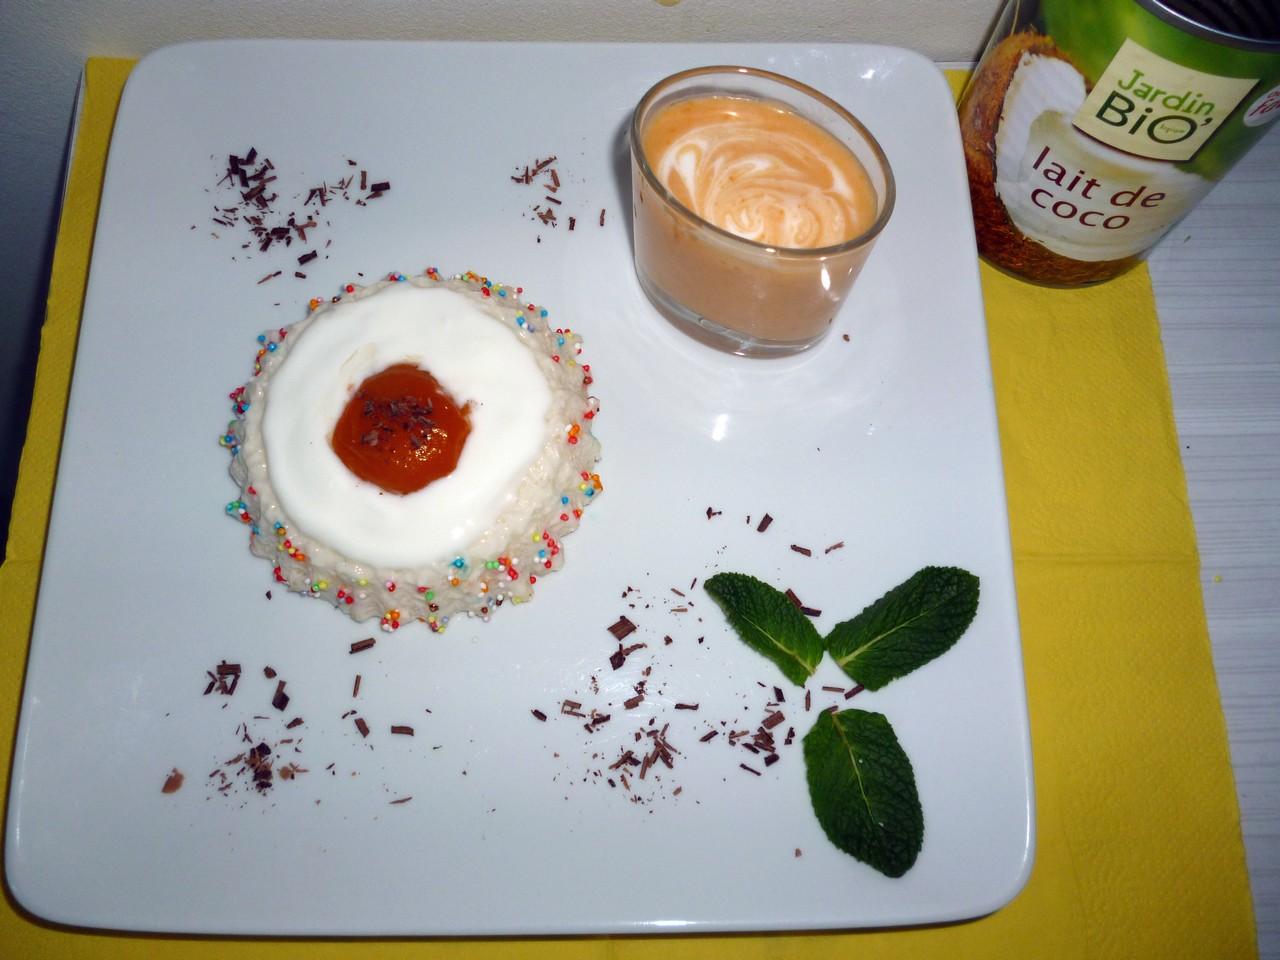 Gâteau de riz coco et milk-shake abricot